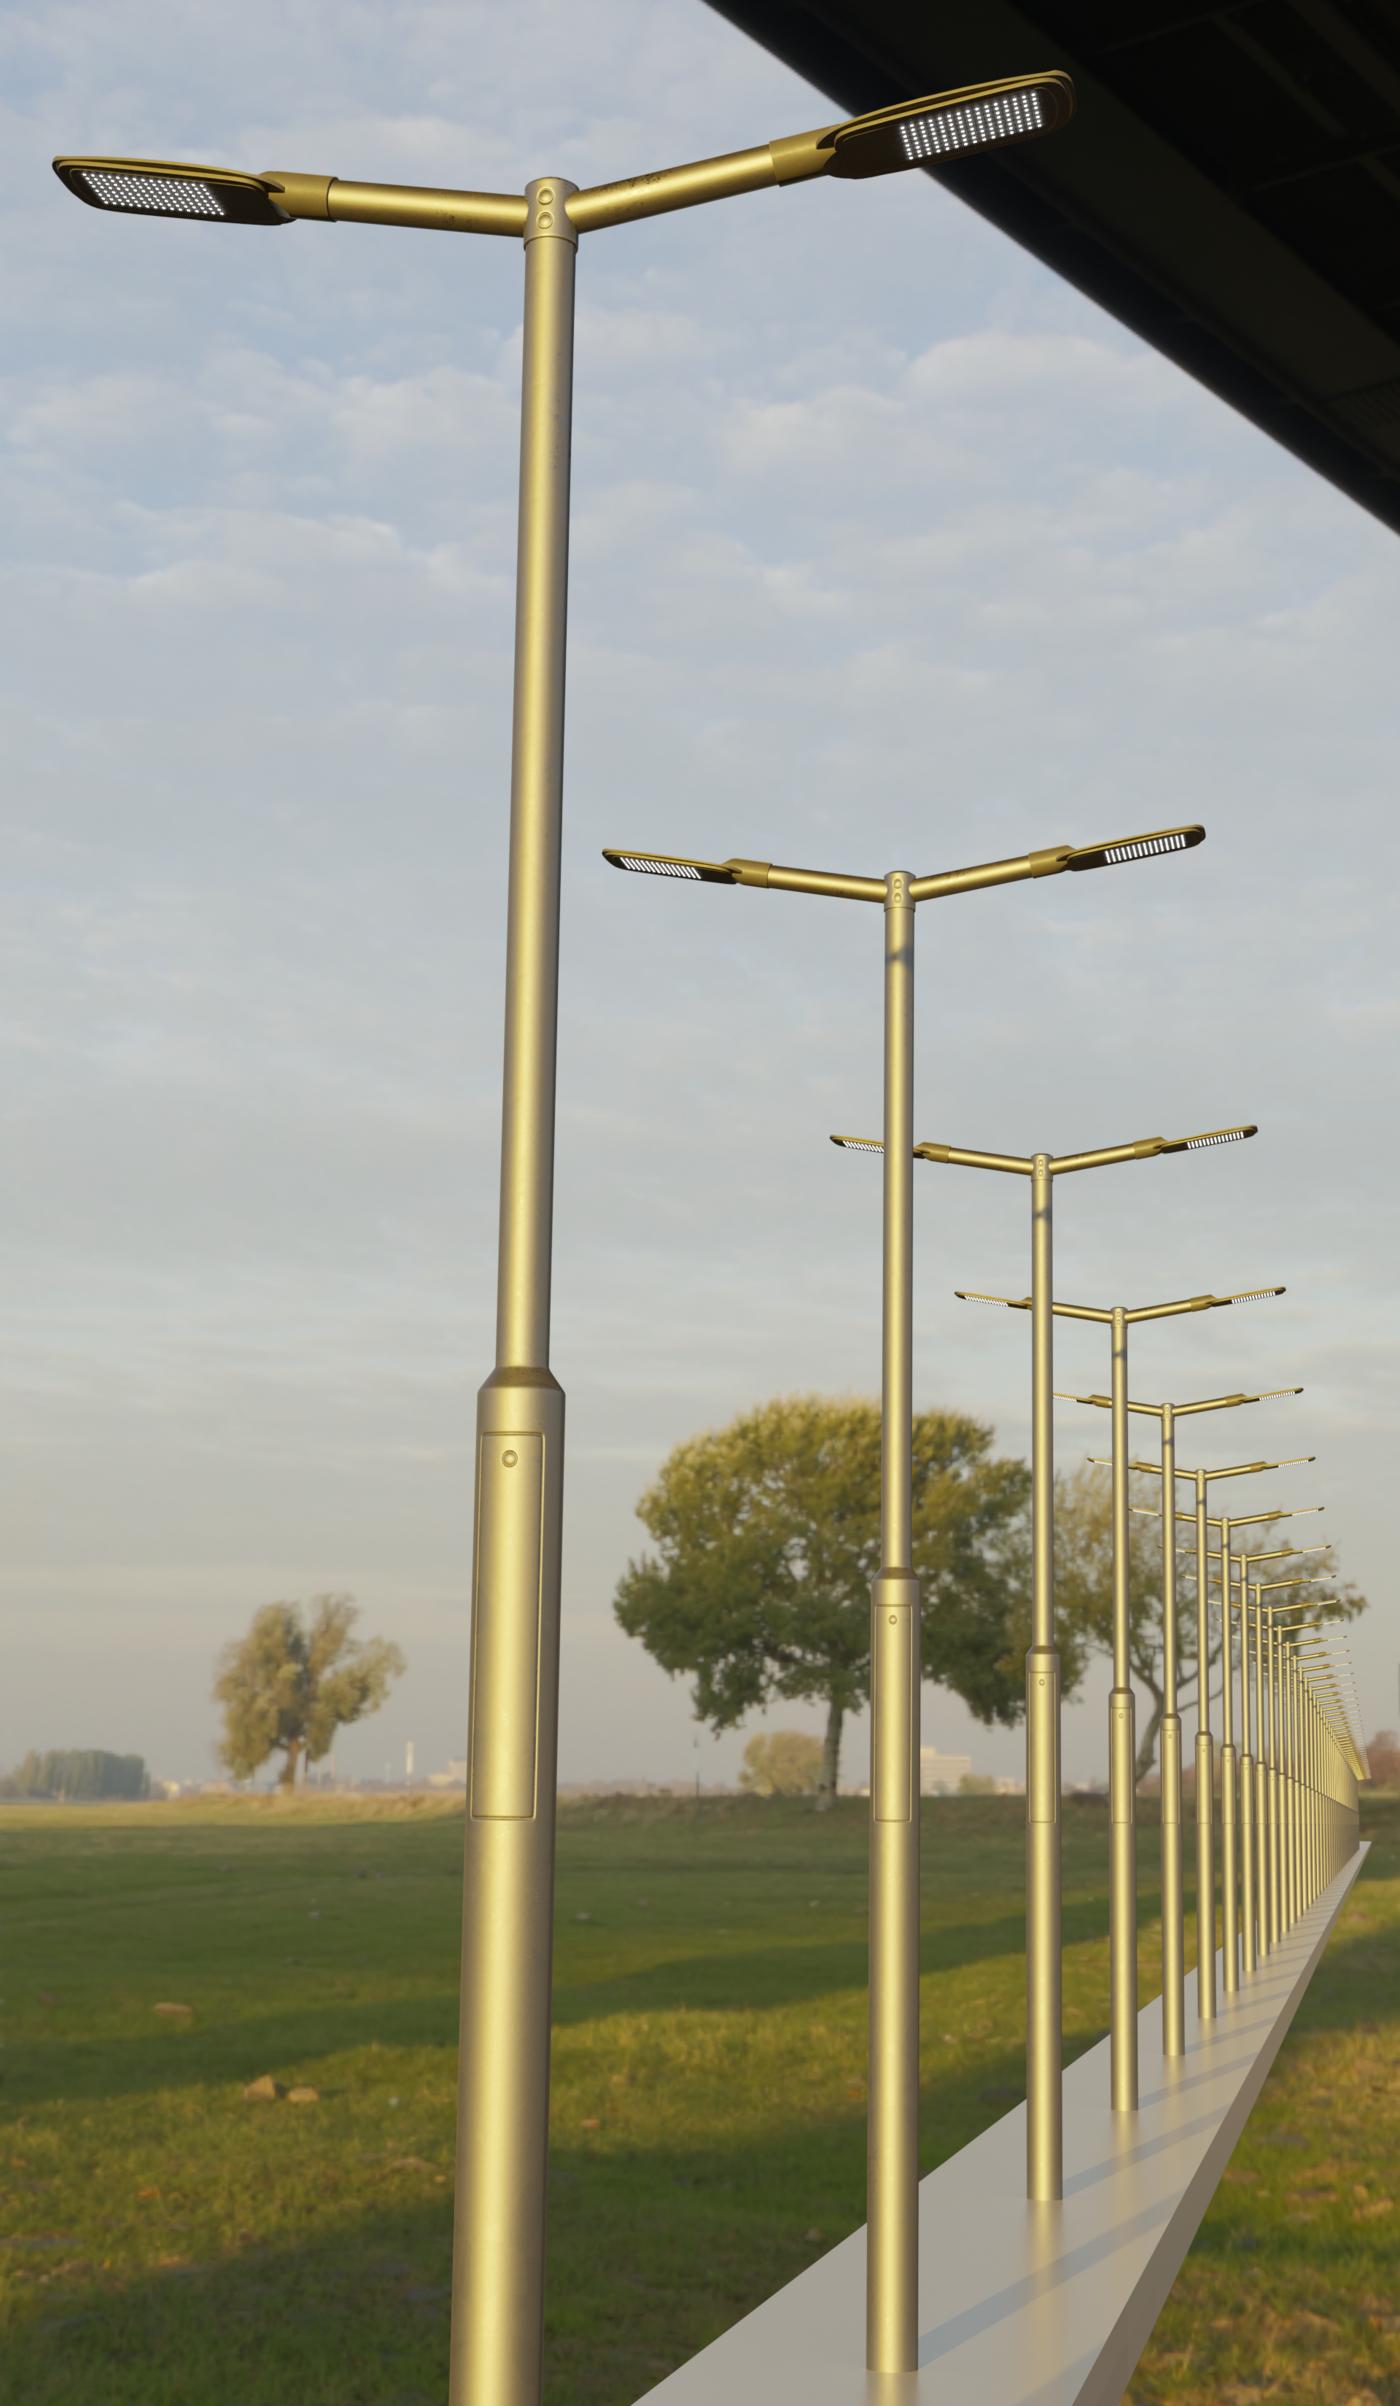 Scifi City Lights - Street Light 12 with Pole 3 Version 2 - Blender-2.80.1